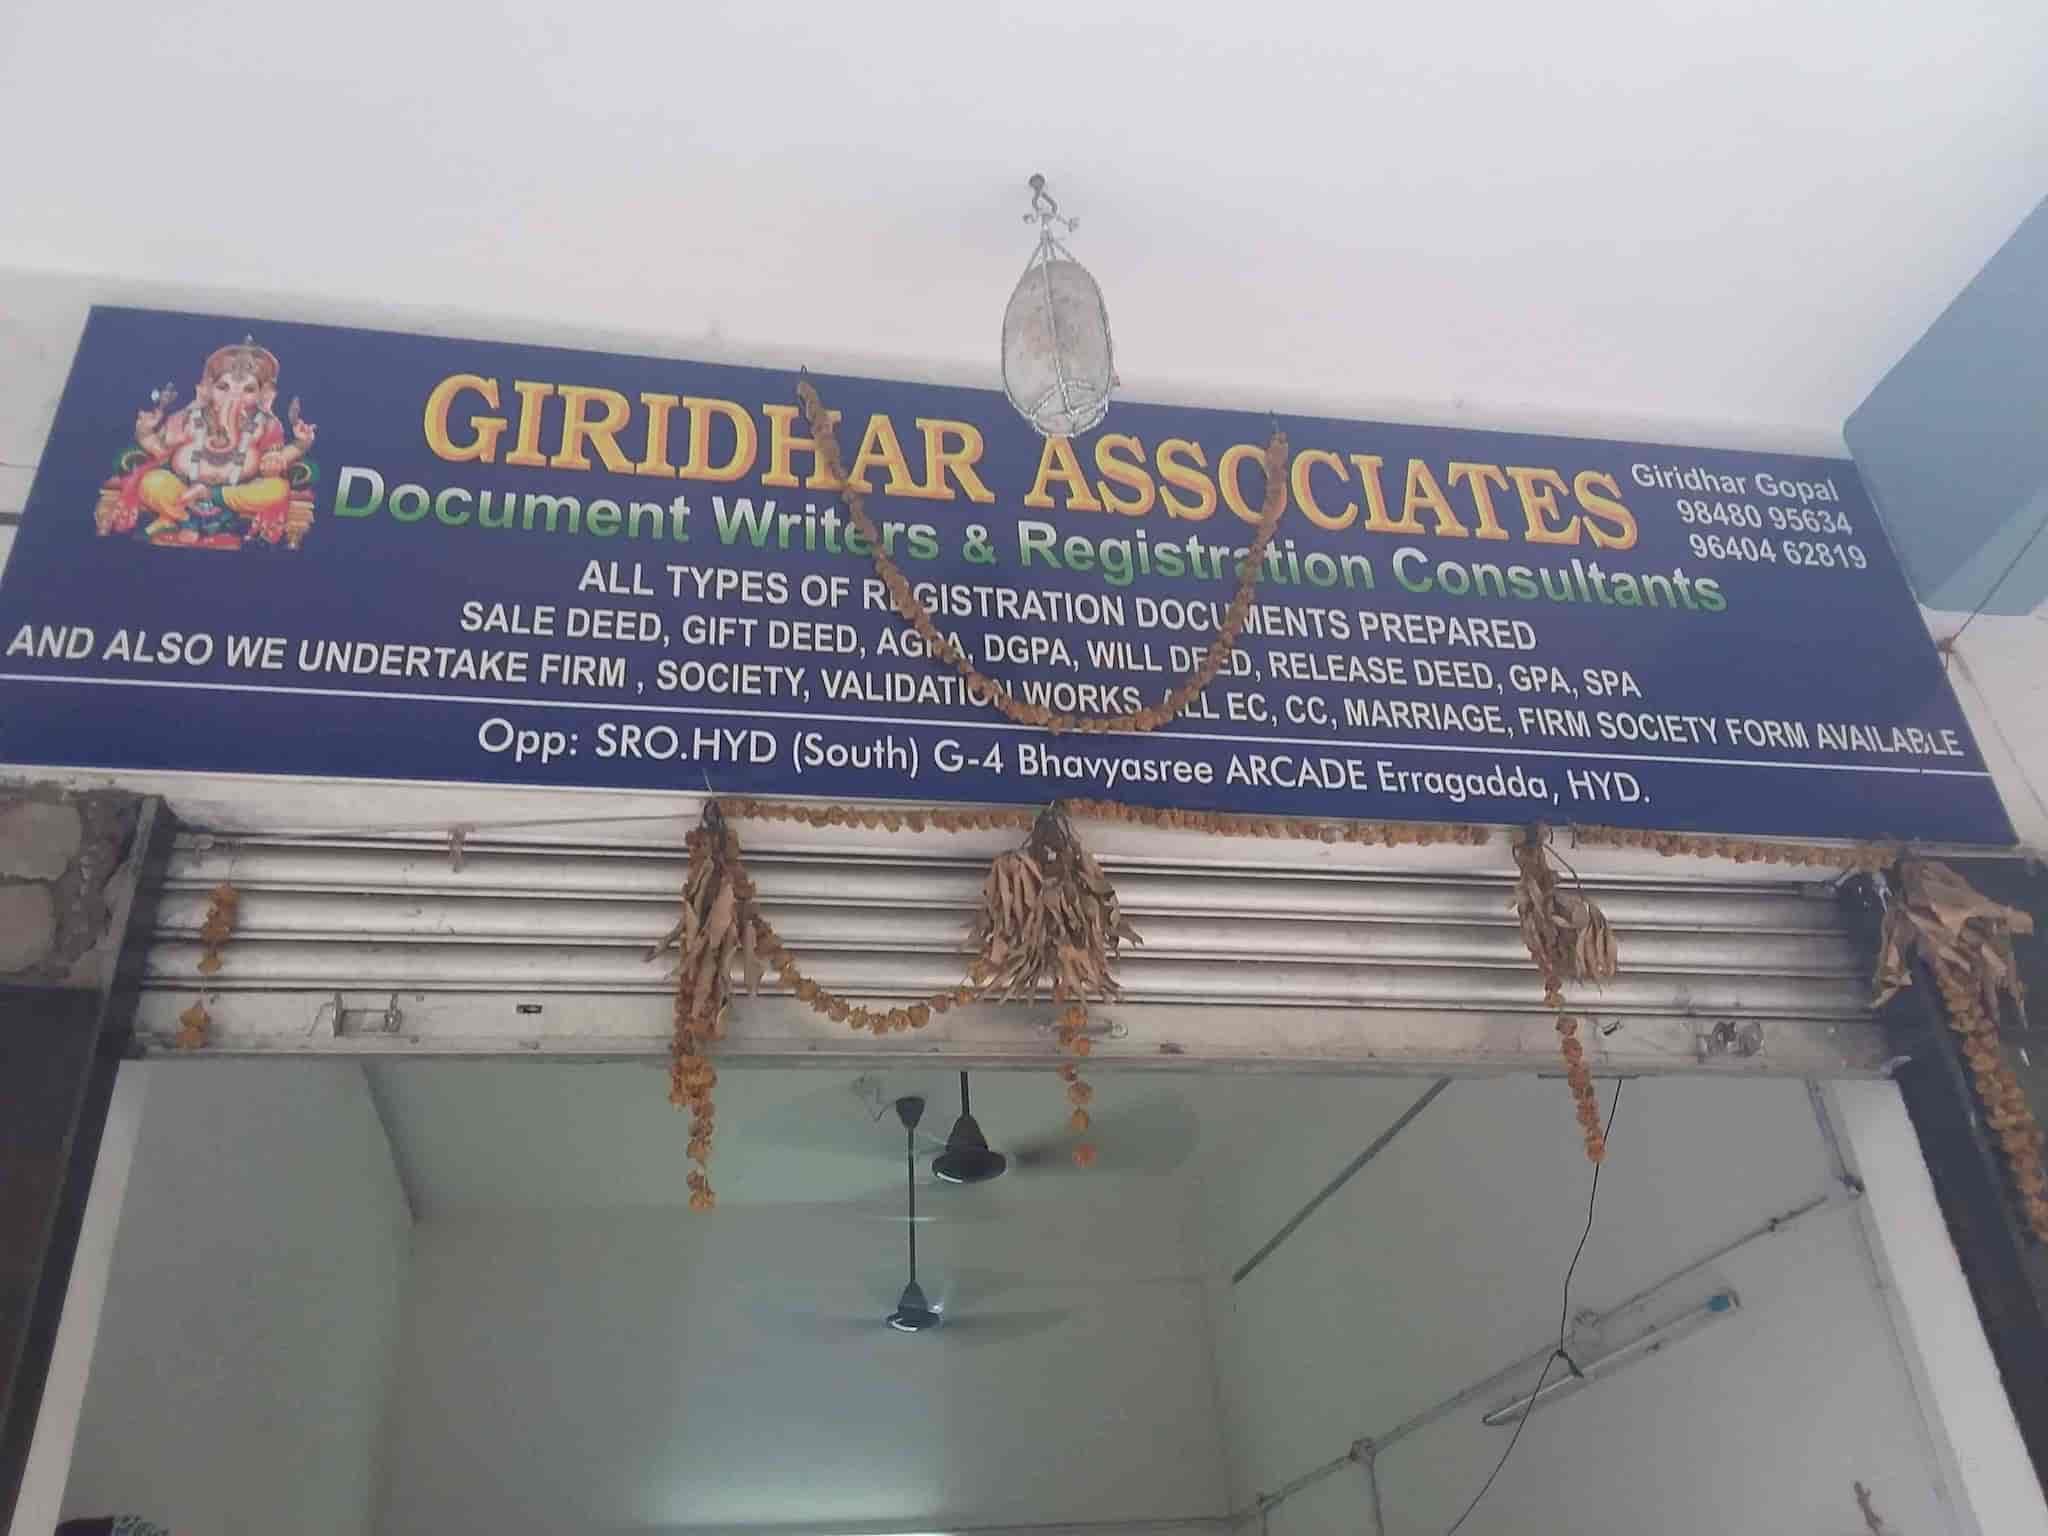 Deccan Chambers, Erragadda - Registration Document Writer in